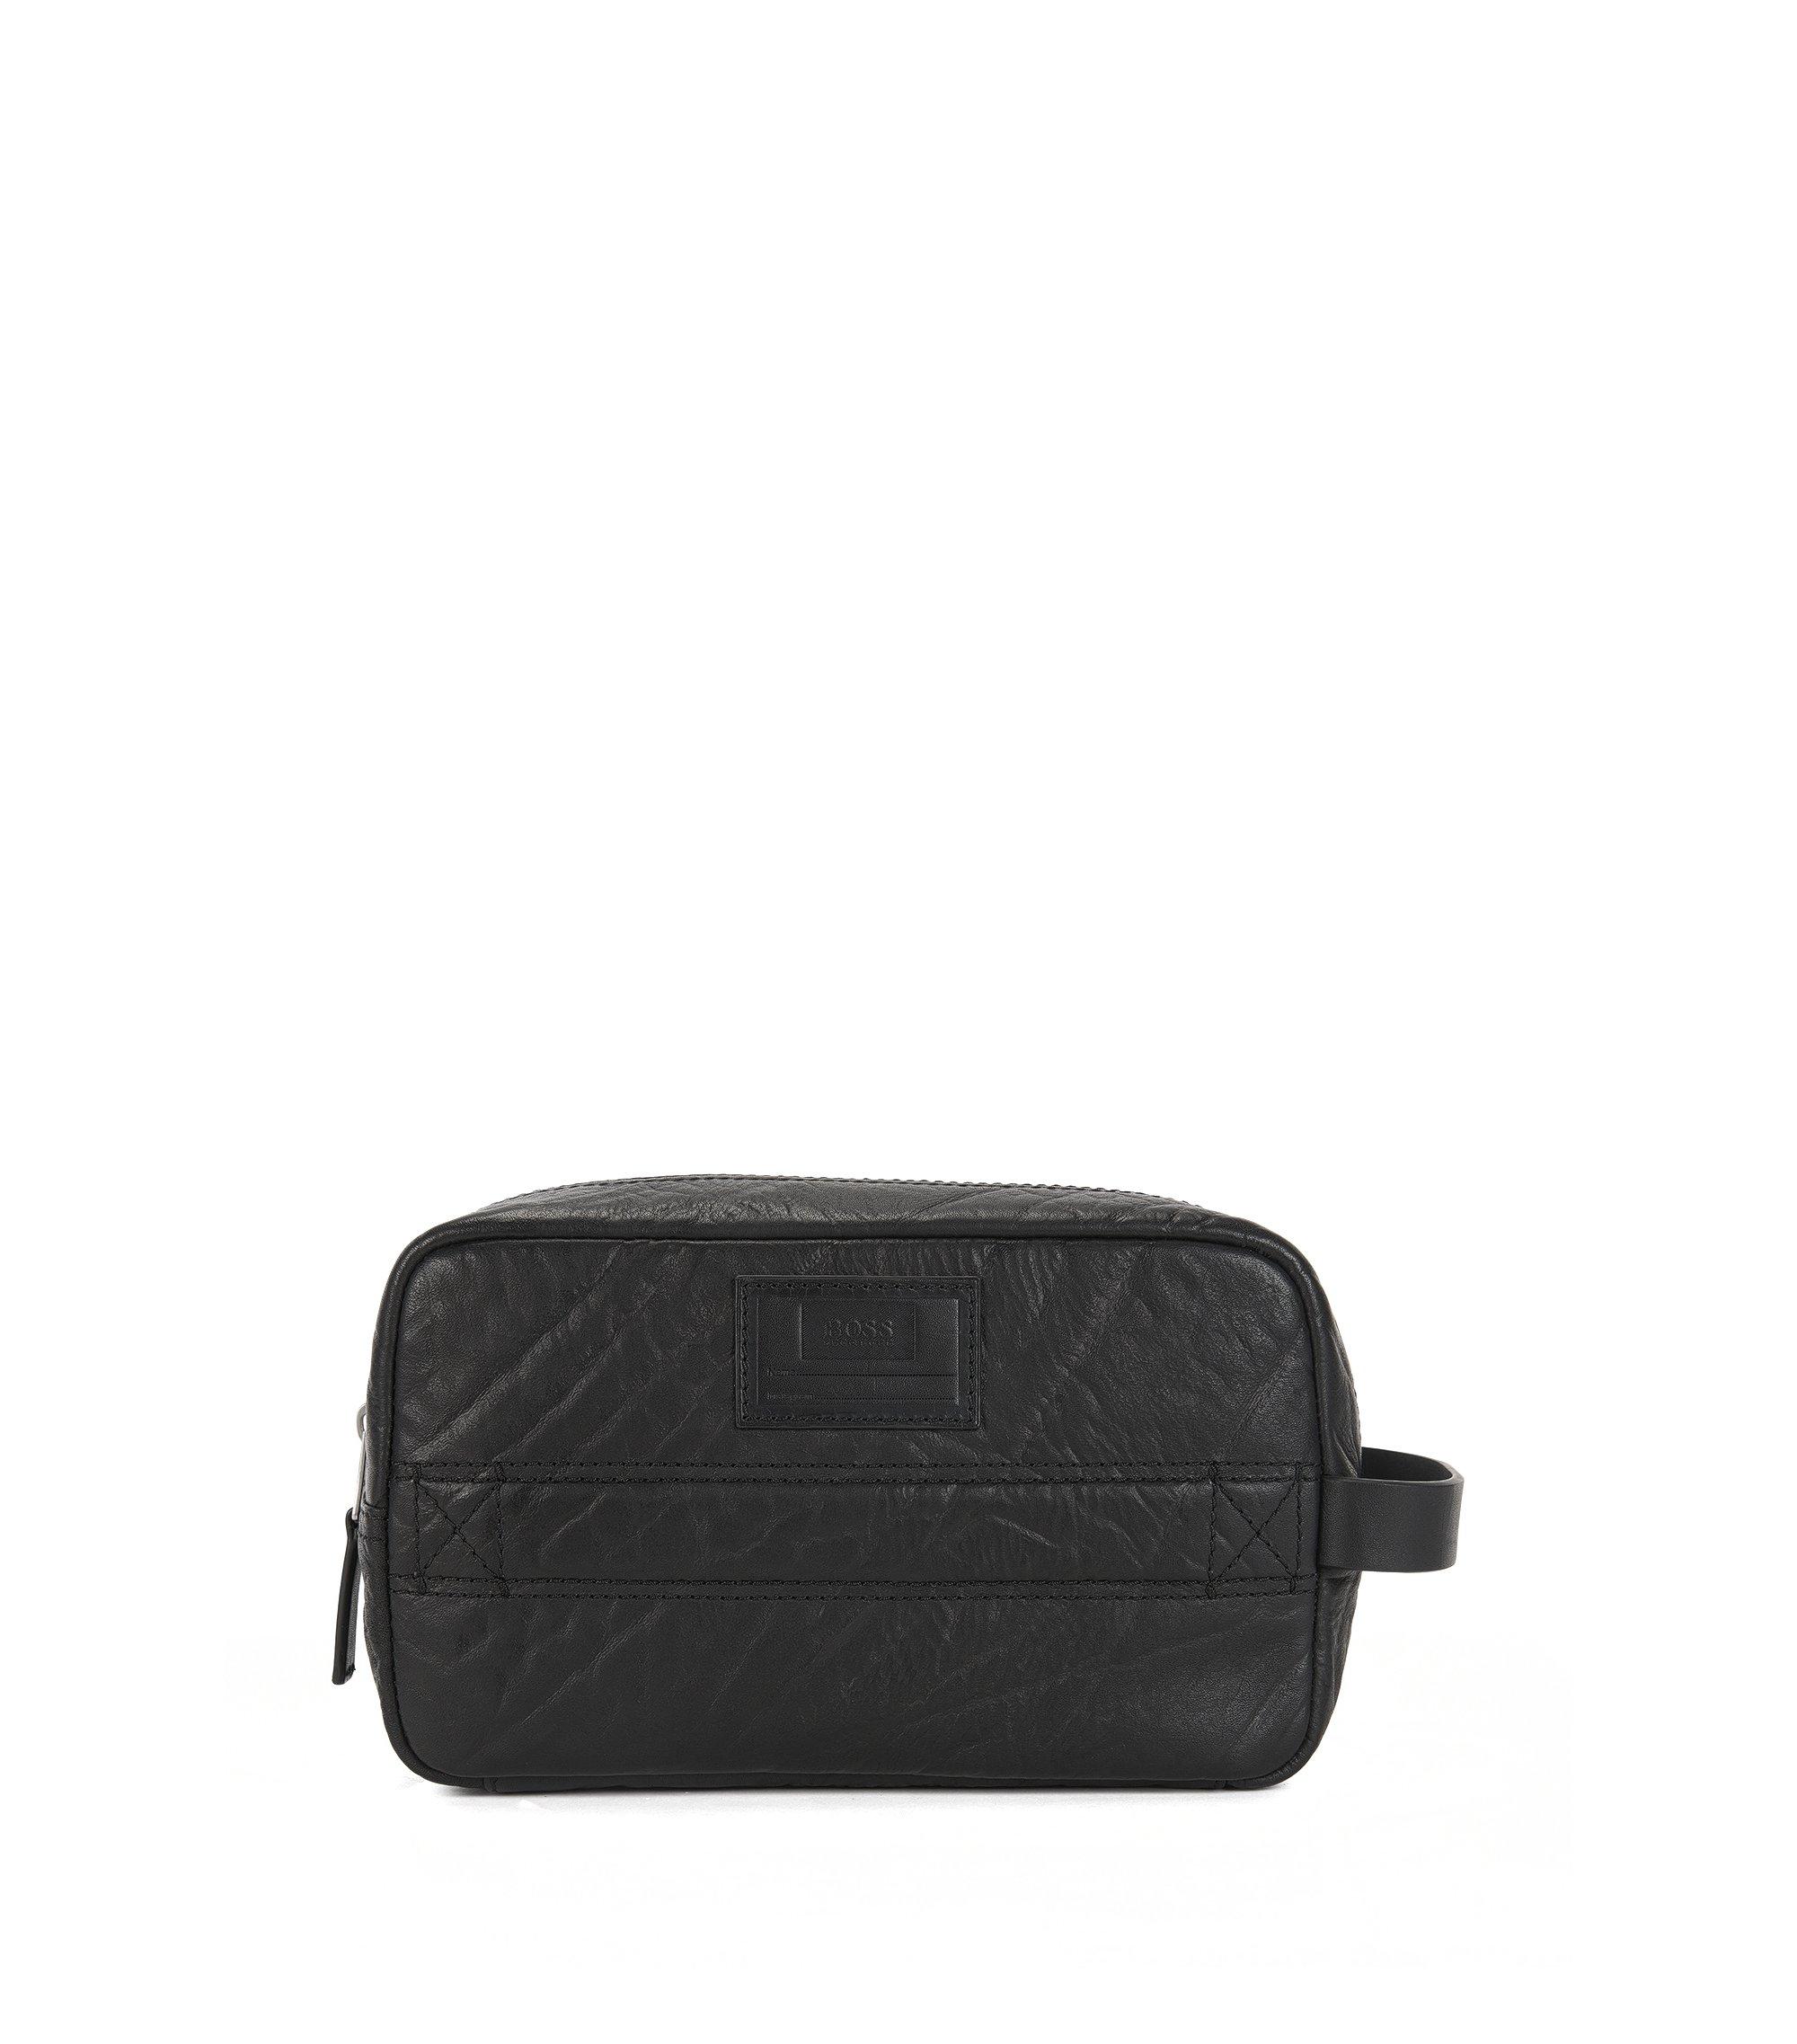 Zip-top wash bag in grained leather, Black